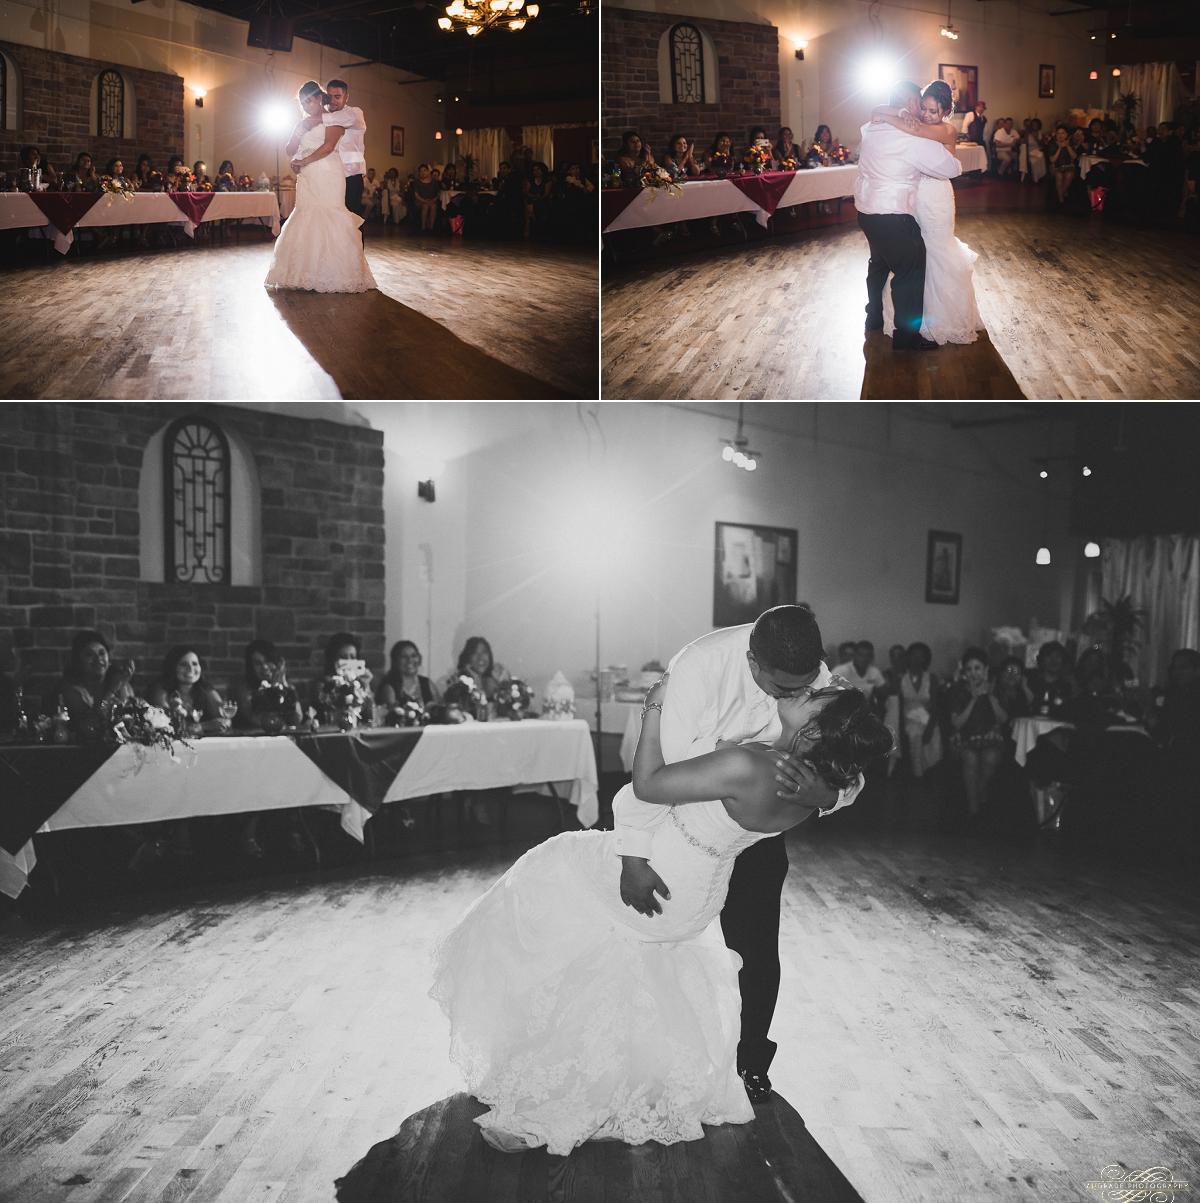 Janette + Louie Estebans Wedding Photography in Naperville - Naperville Wedding Photographer_0073.jpg